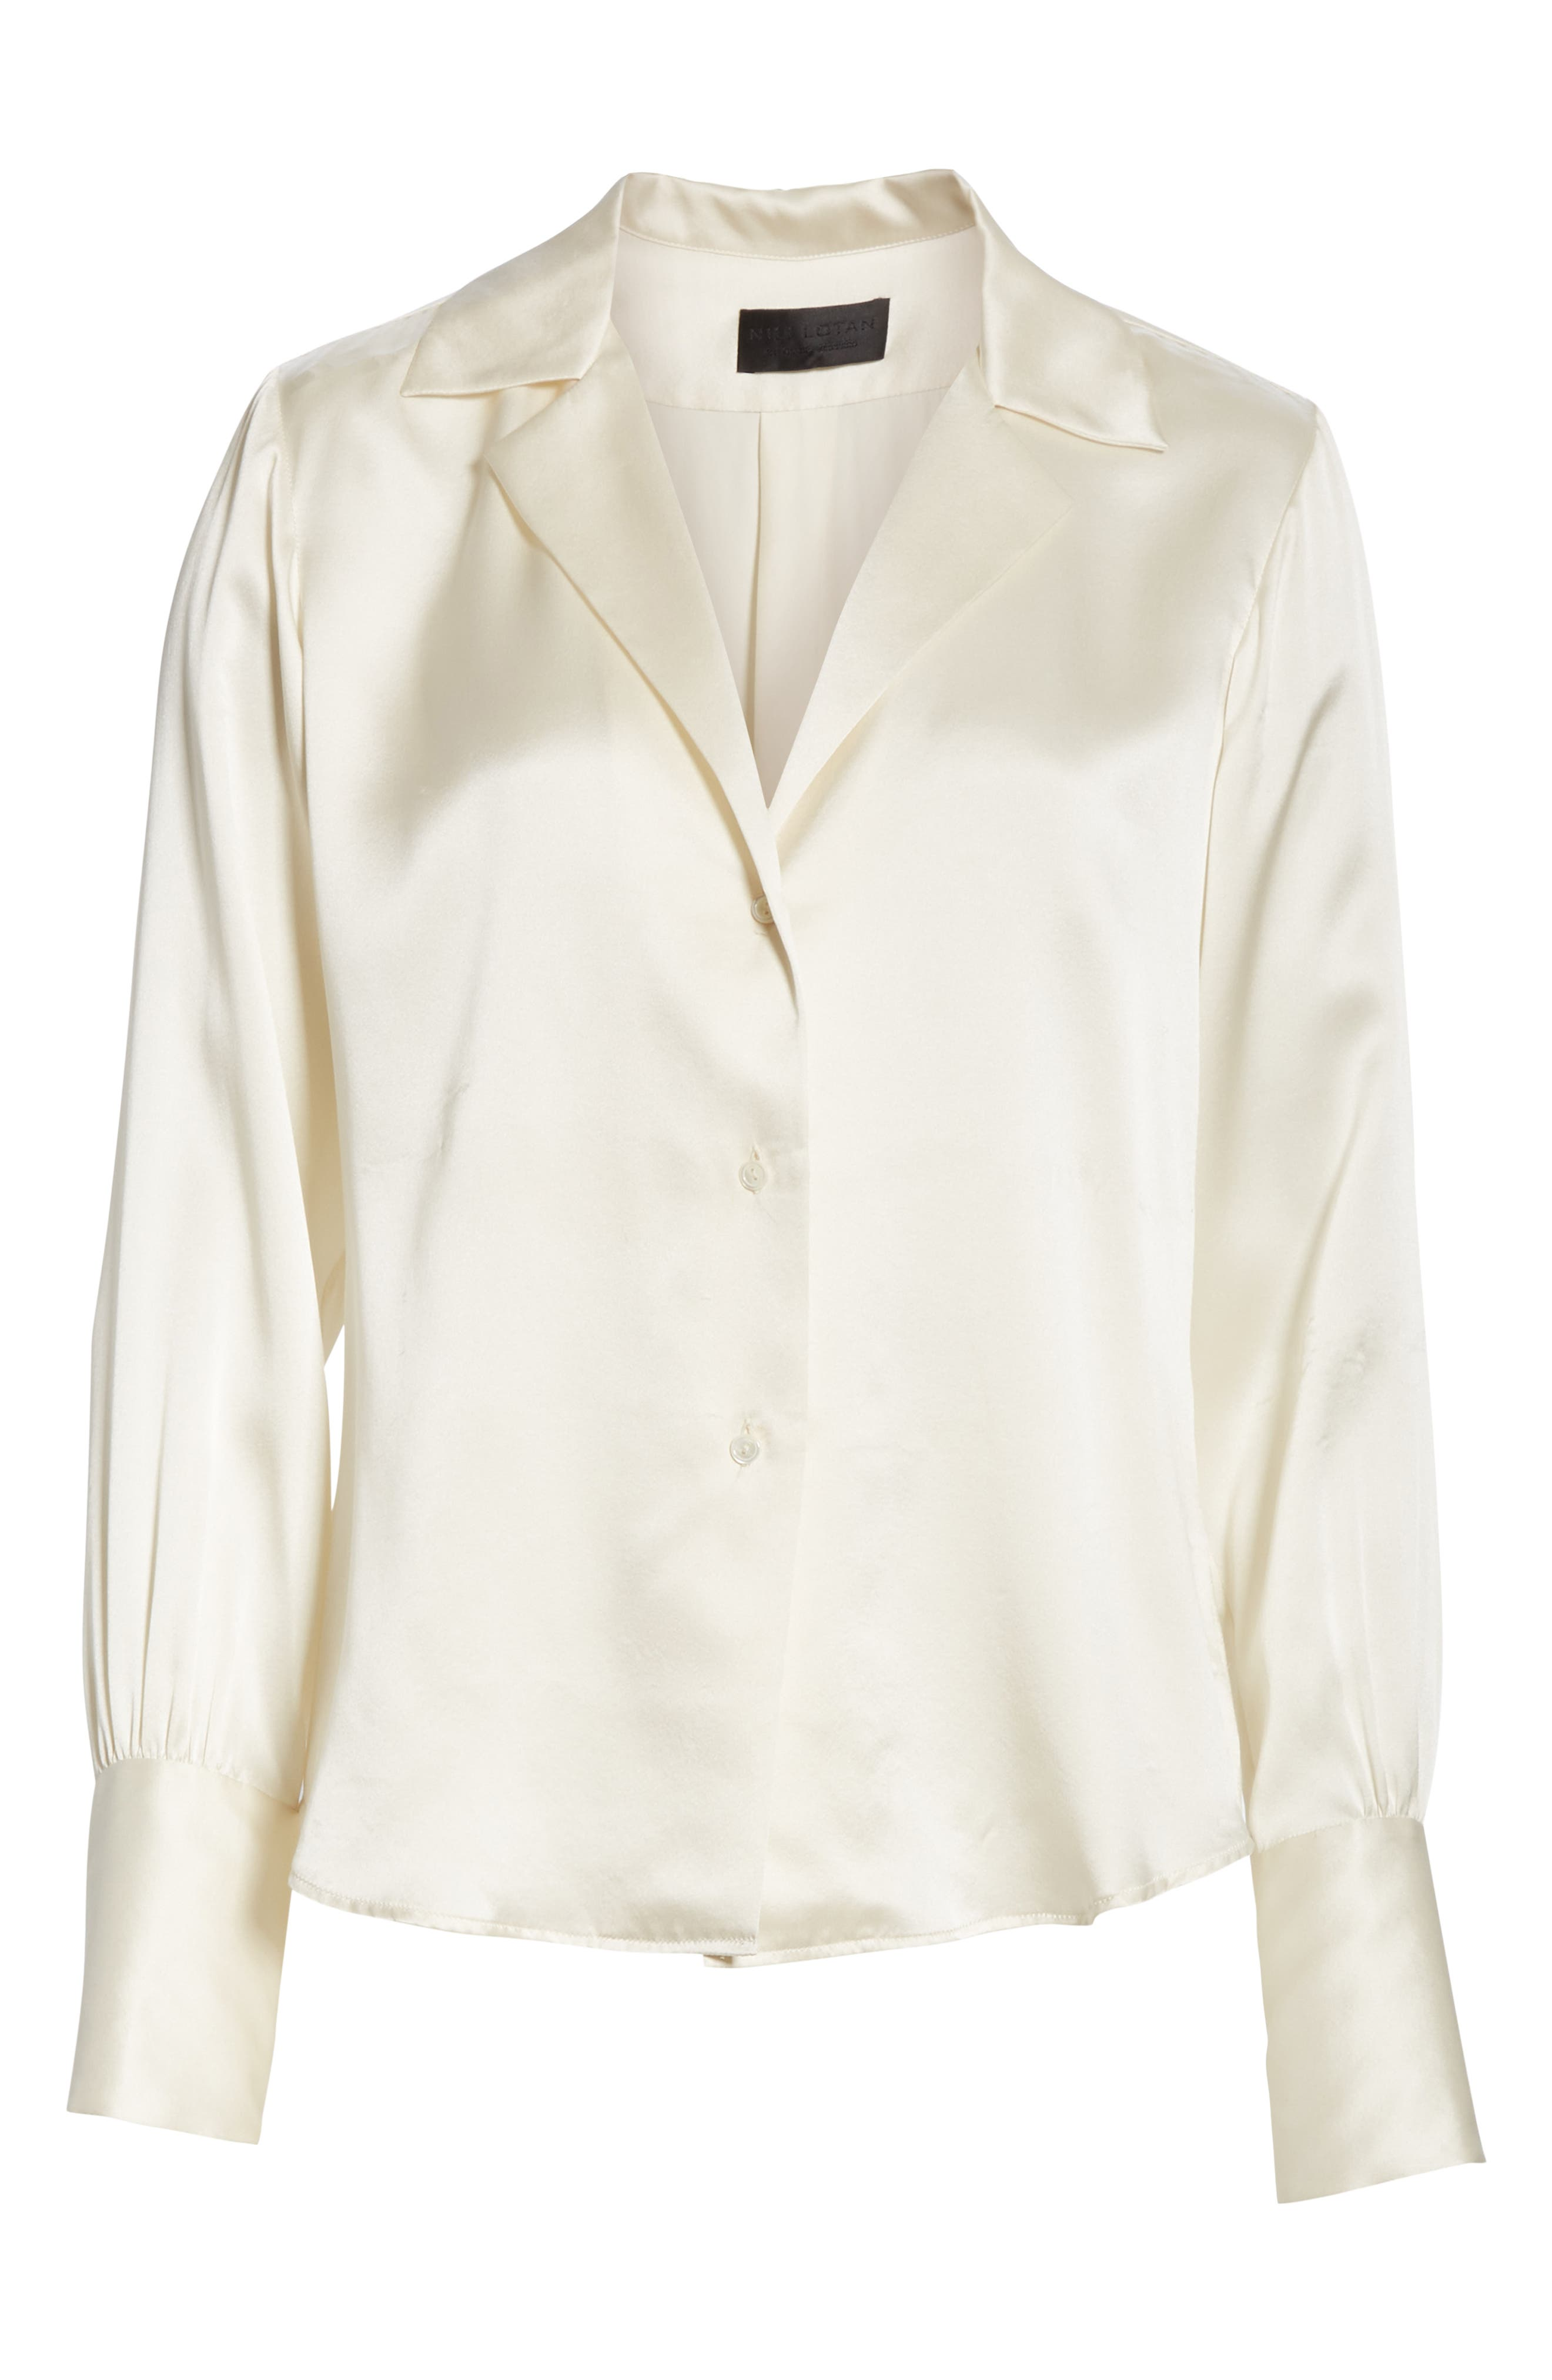 NILI LOTAN, Emmen Silk Shirt, Alternate thumbnail 6, color, IVORY